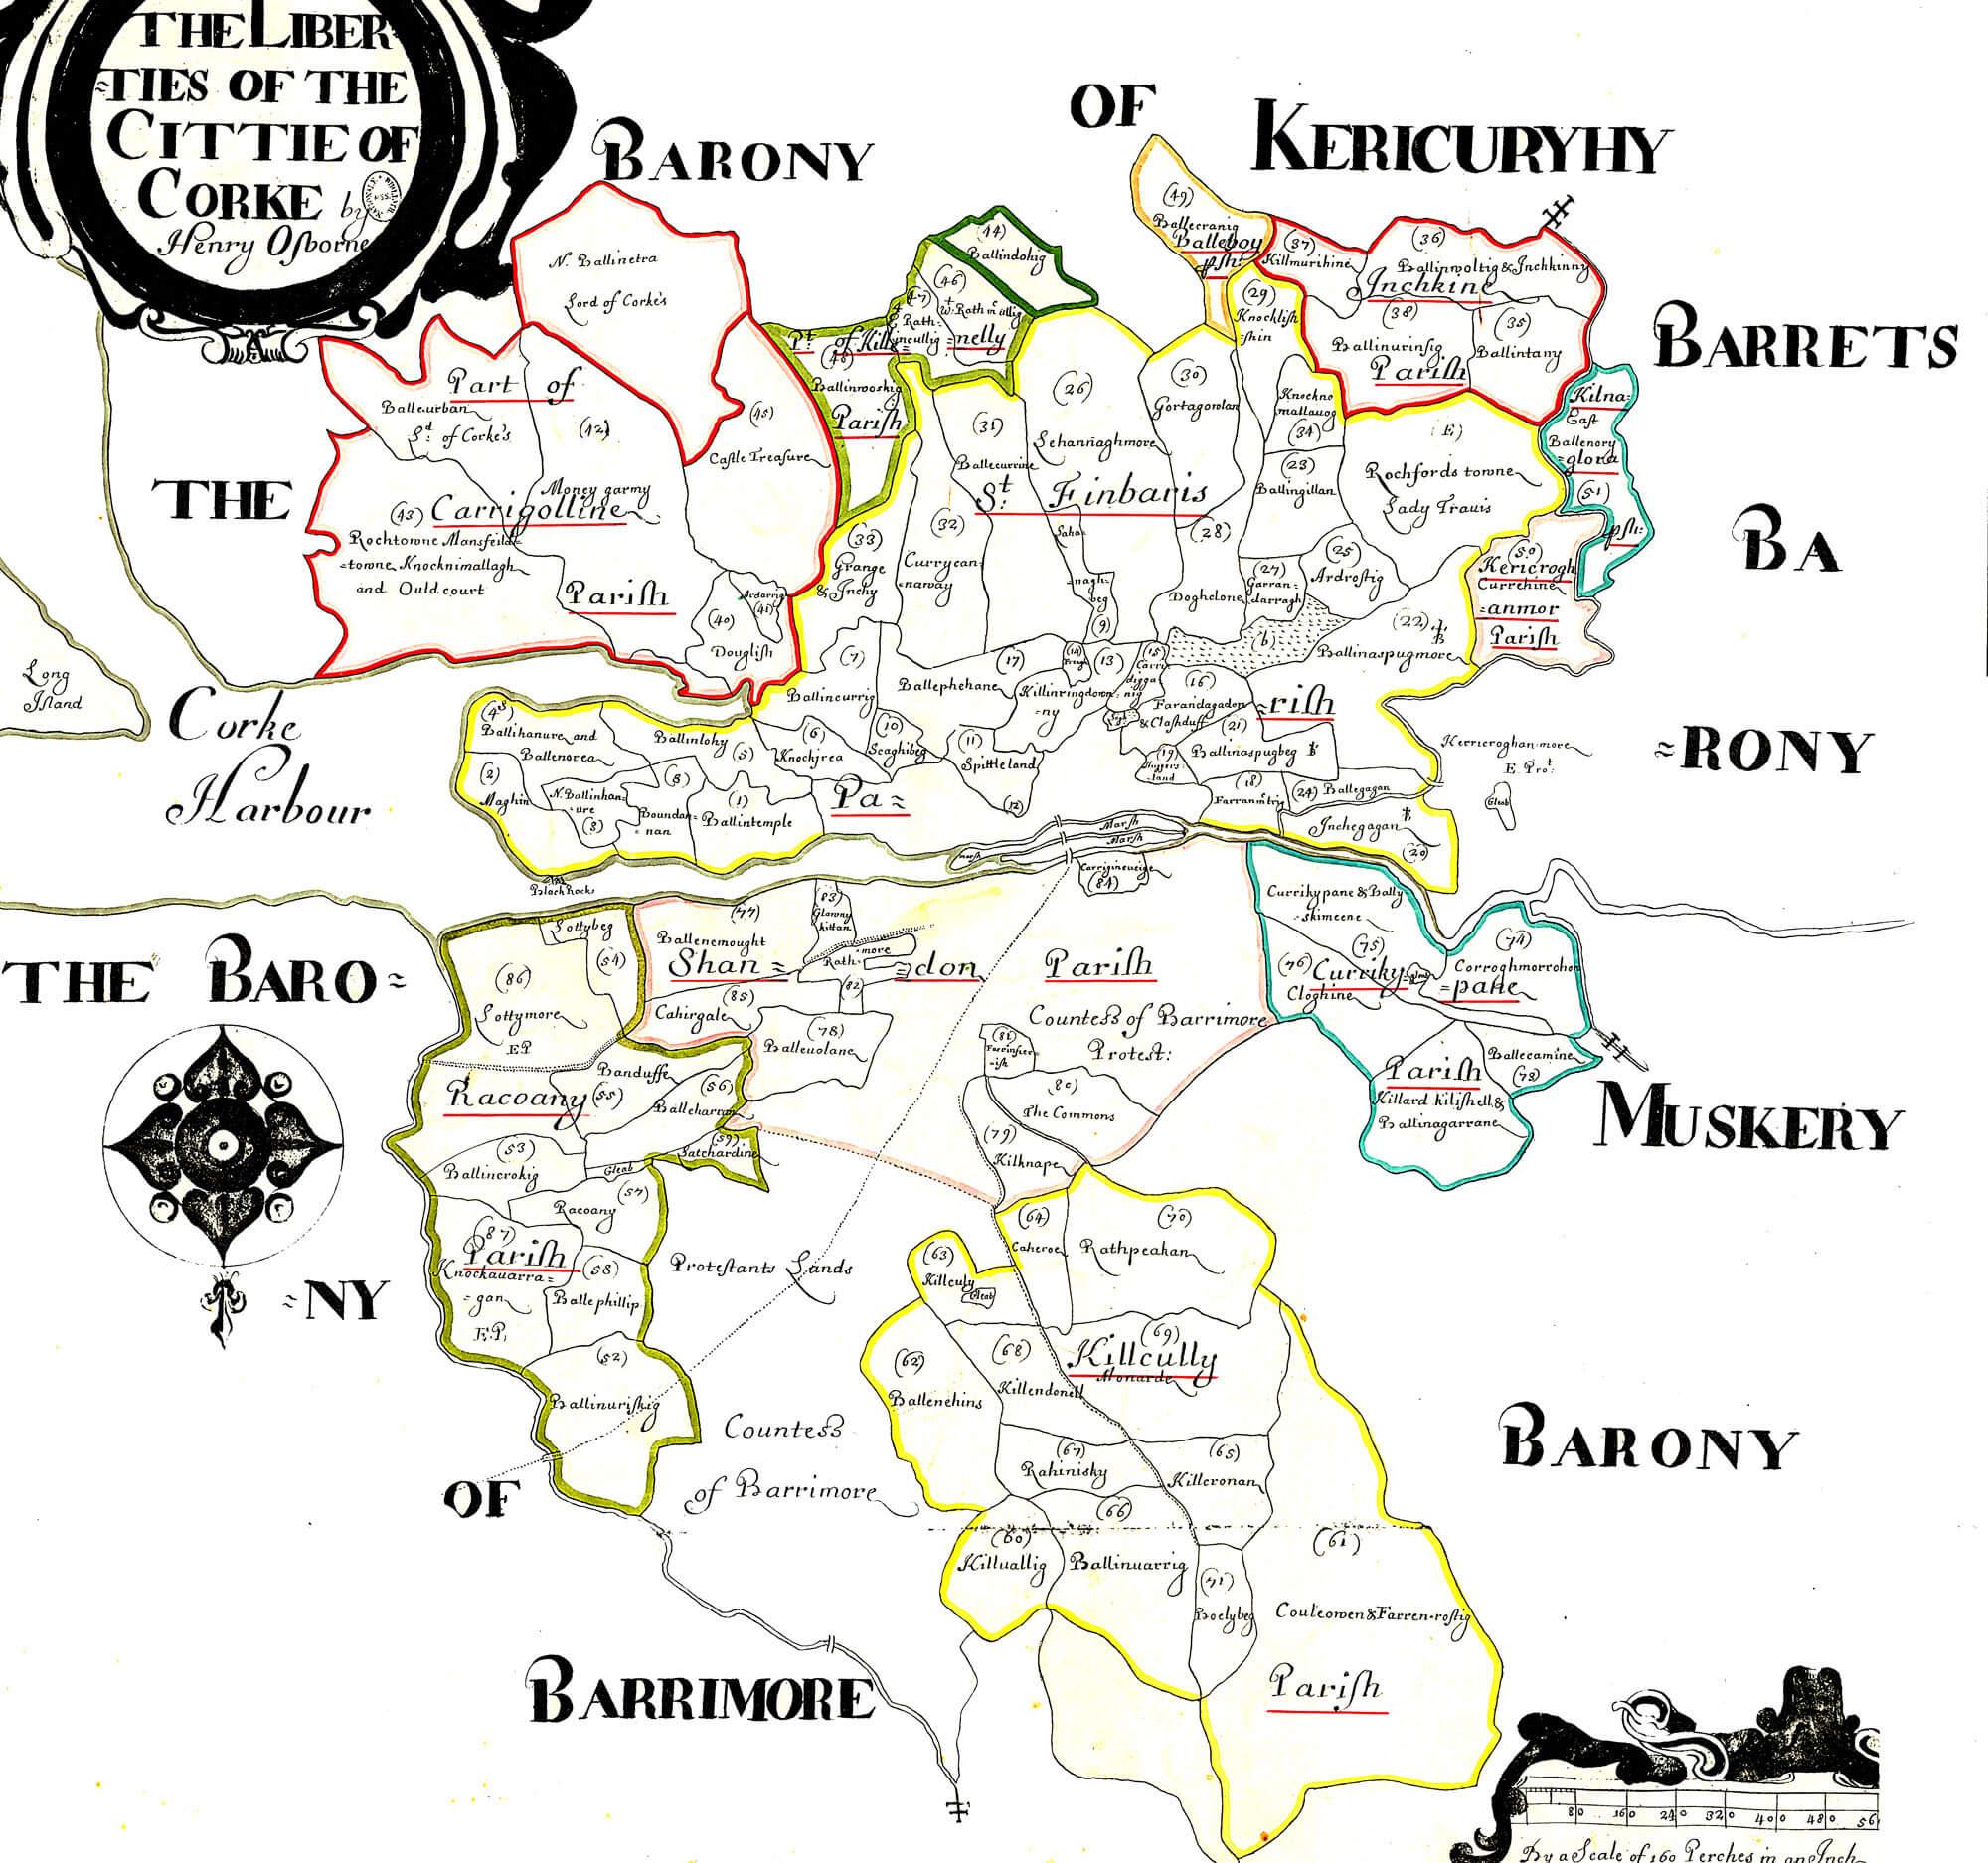 Ireland barony maps county cork l brown collection cork liberties gumiabroncs Choice Image